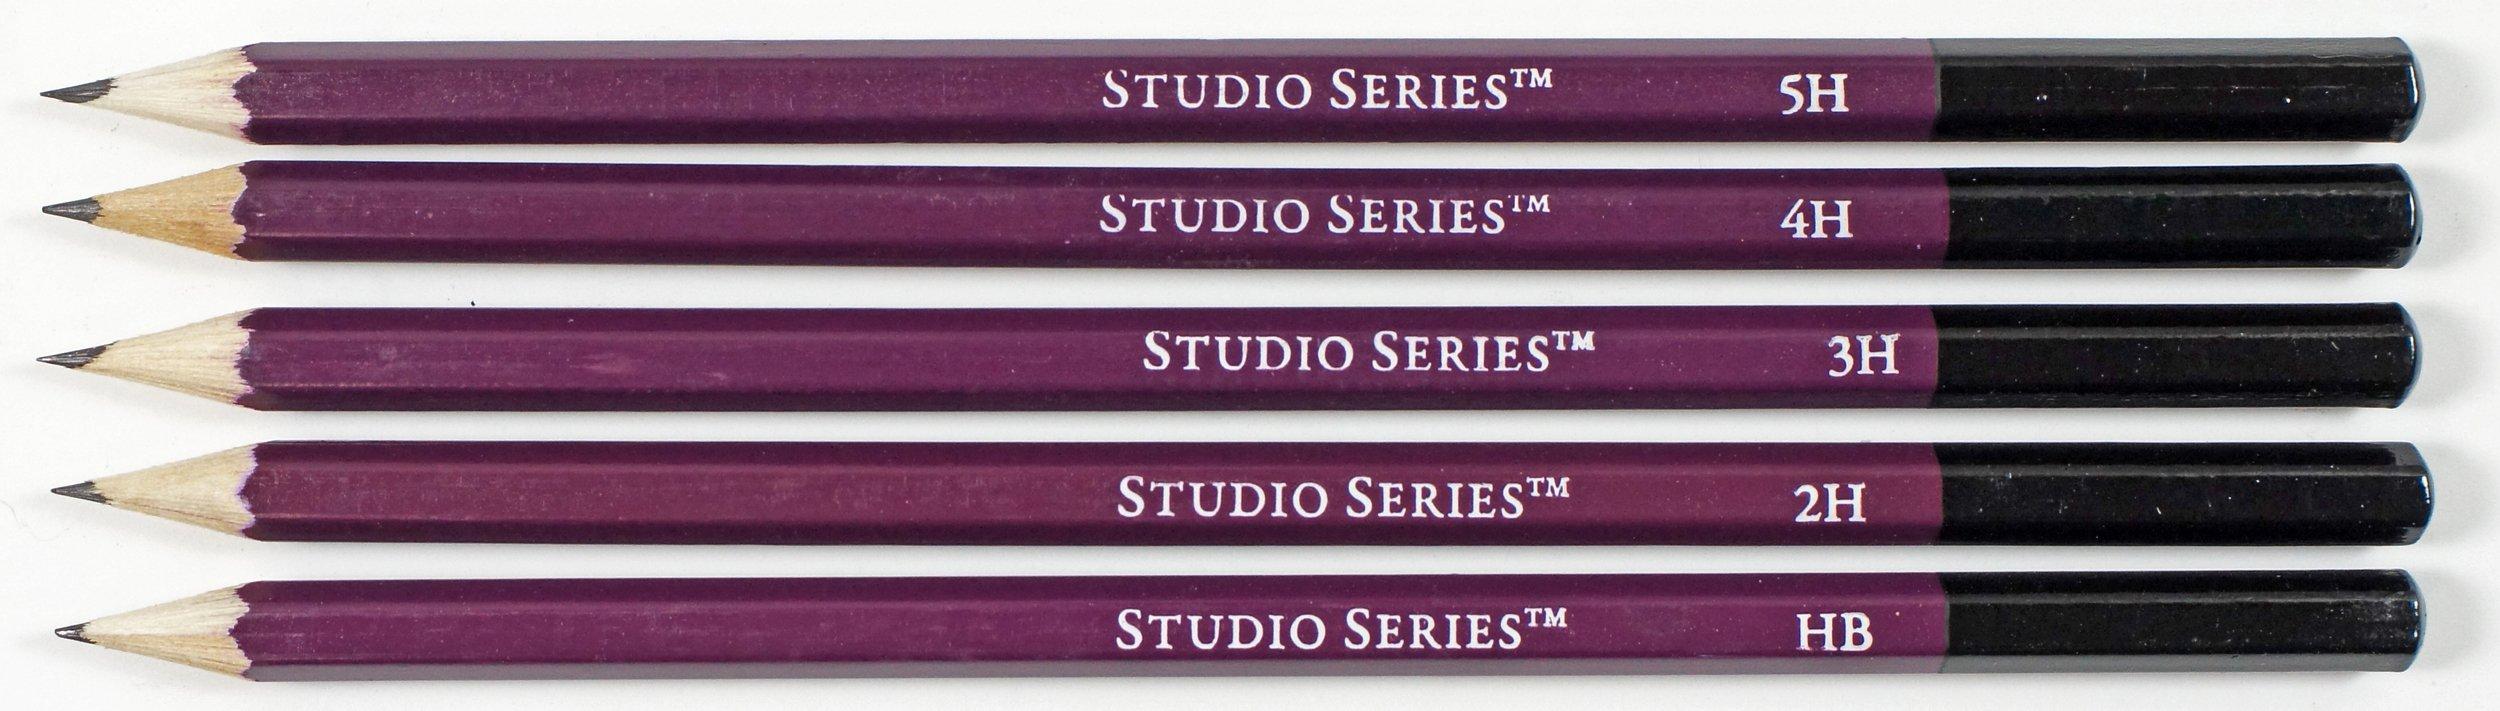 Studio Series 25-Piece Sketch & Drawing Pencil Set (Artist's Pencil and  Charcoal Set): Peter Pauper Press: 9781441310200: Amazon.com: Books